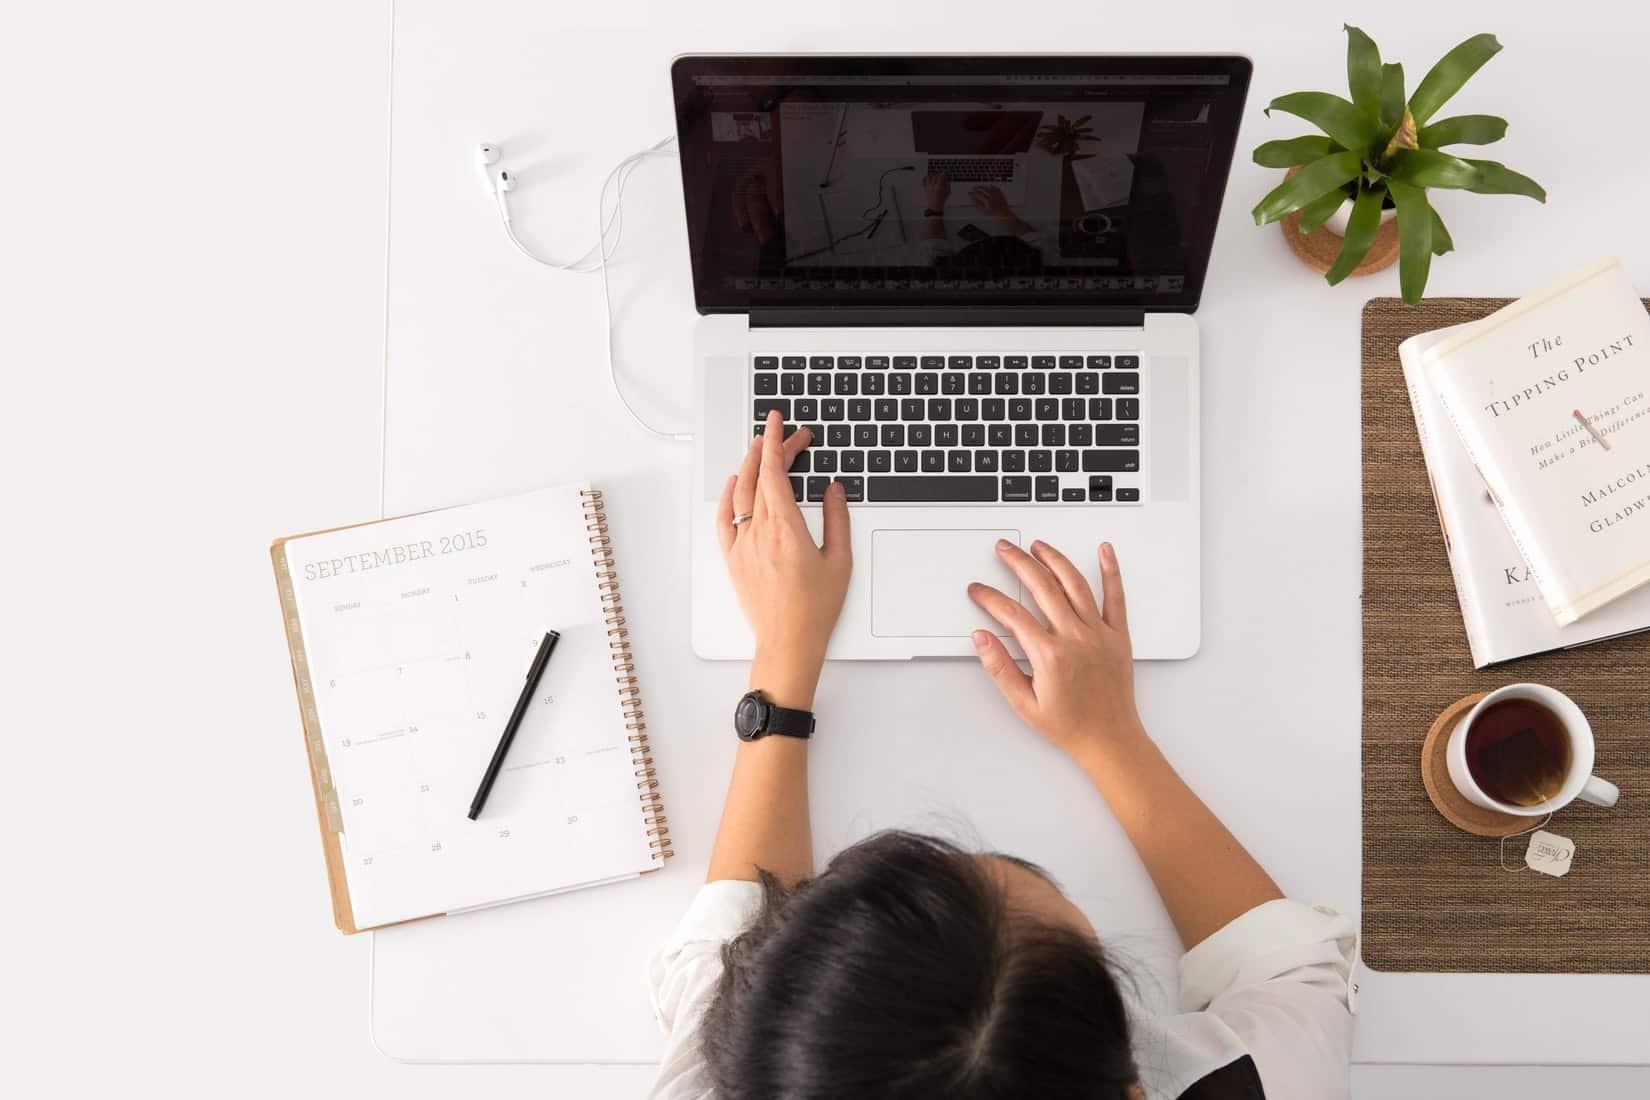 mandatory e-learning